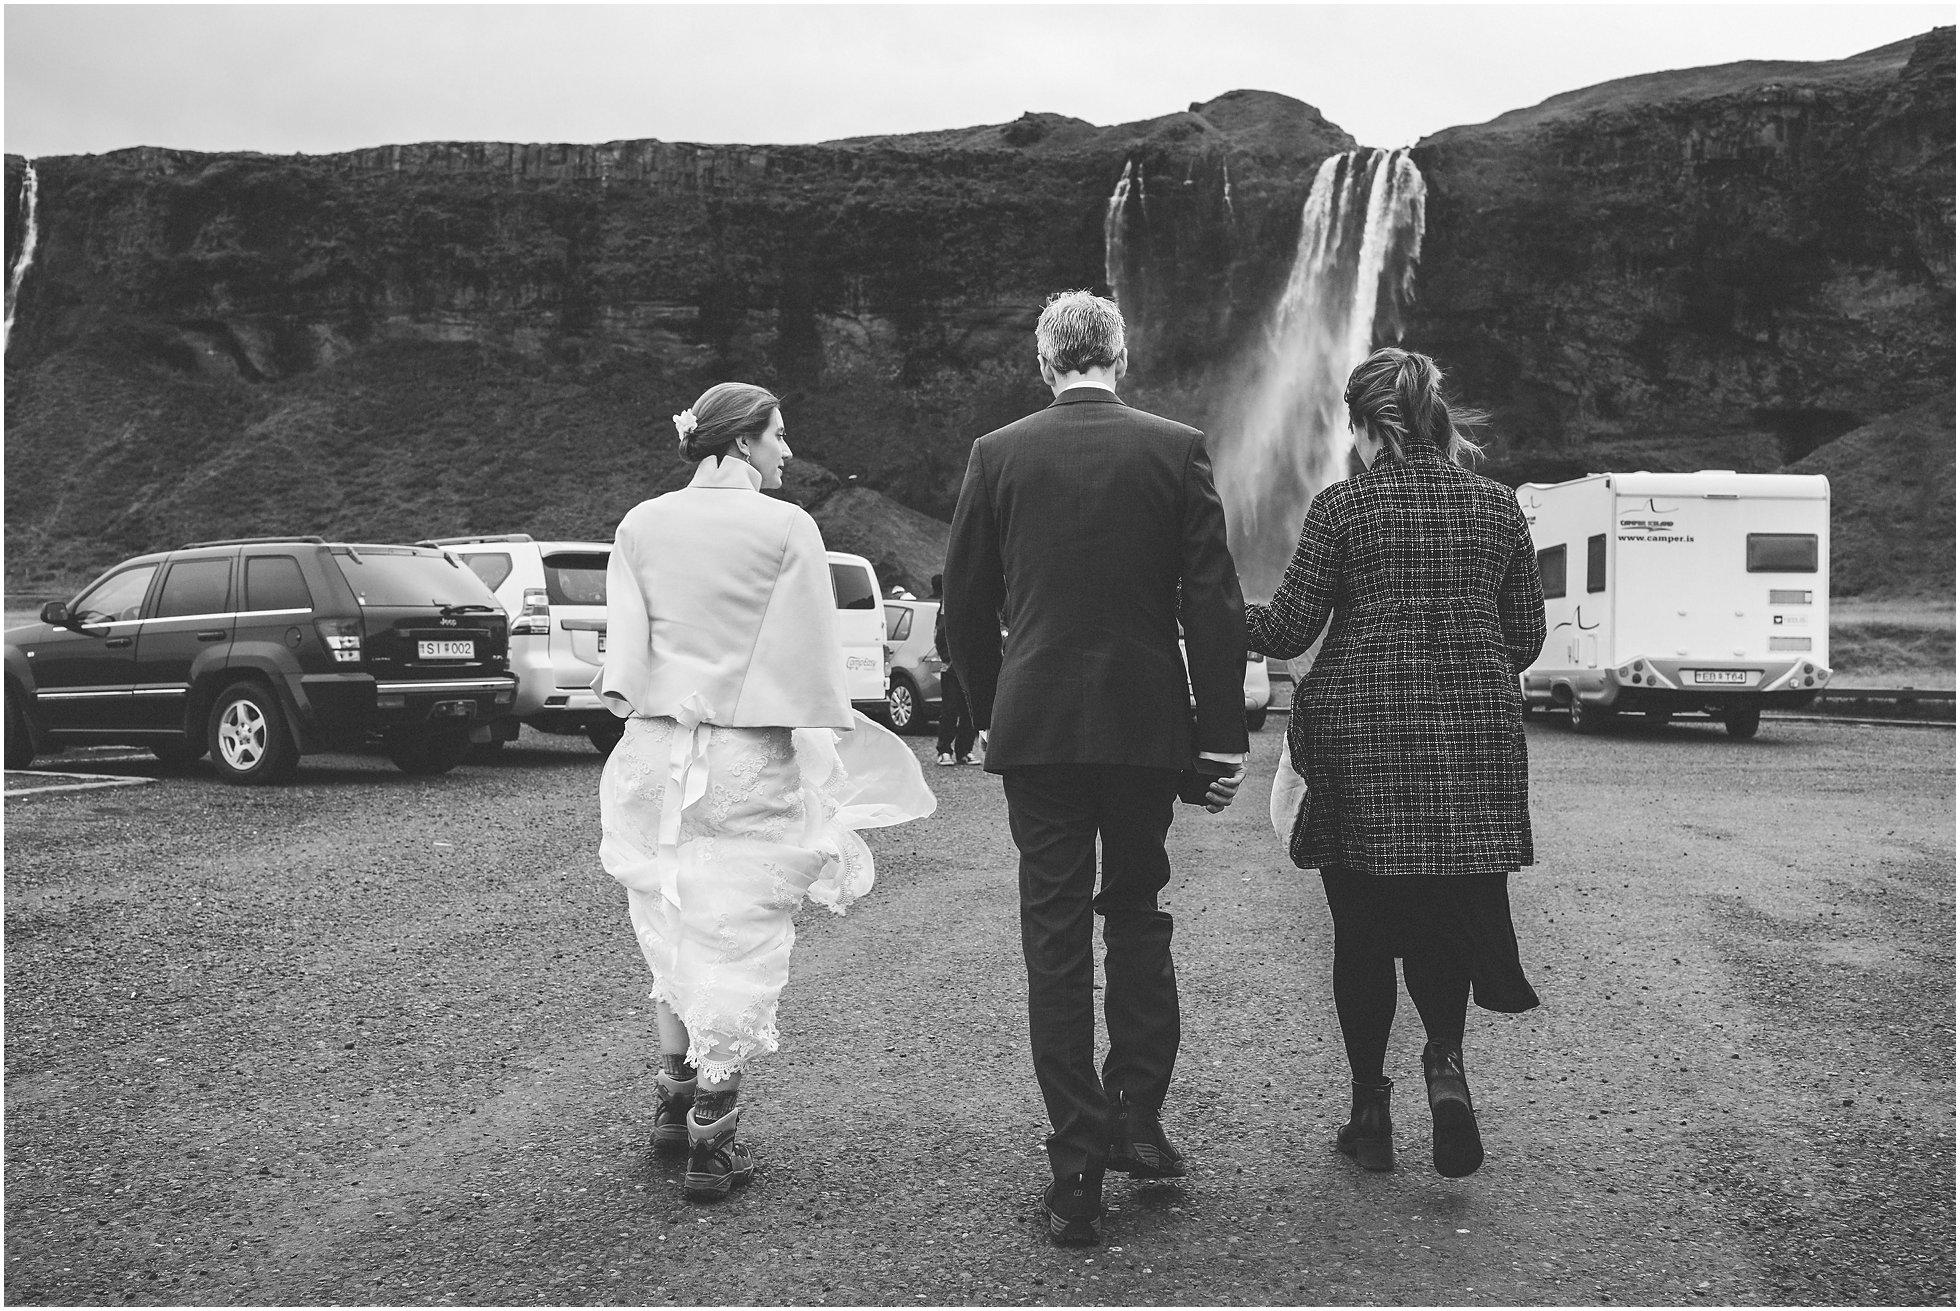 Walking to Seljalandsfoss for their wedding ceremony